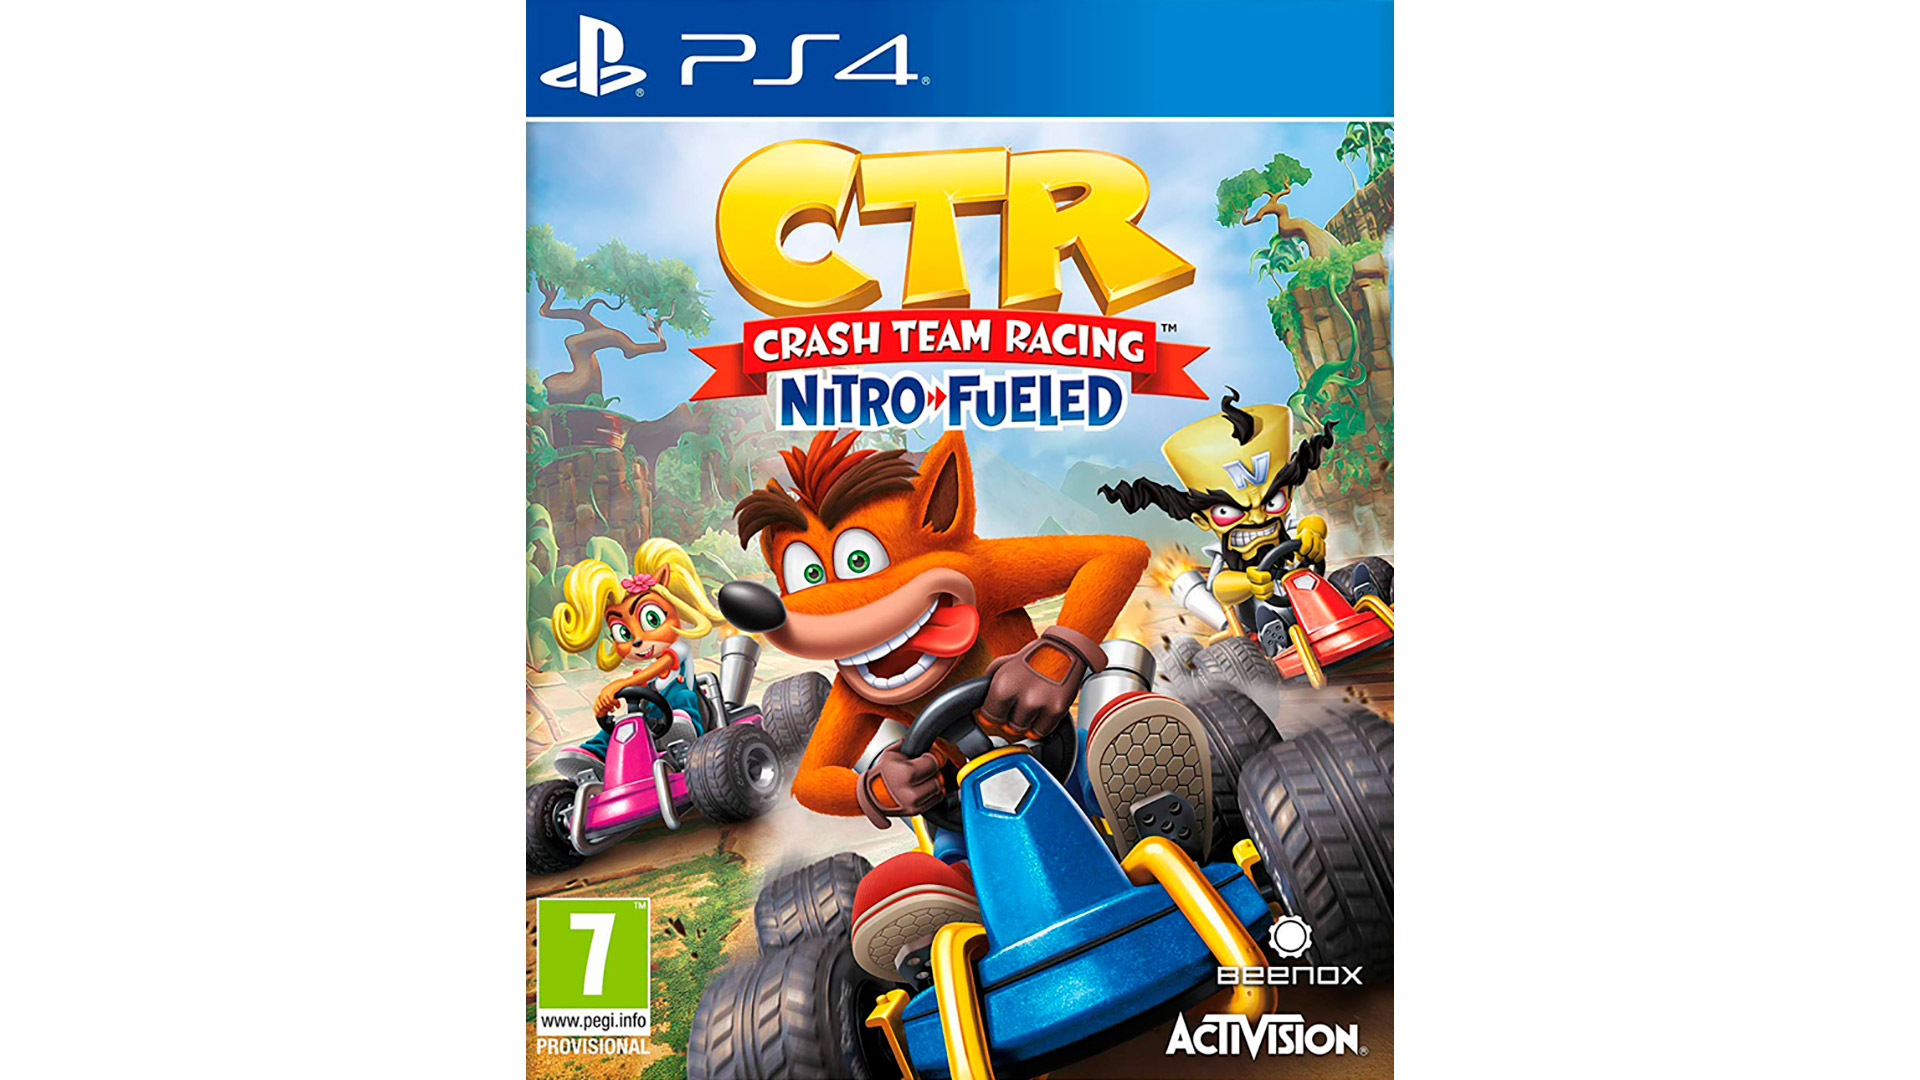 Crash Team Racing Nitro-Fueled игра для PlayStation 4